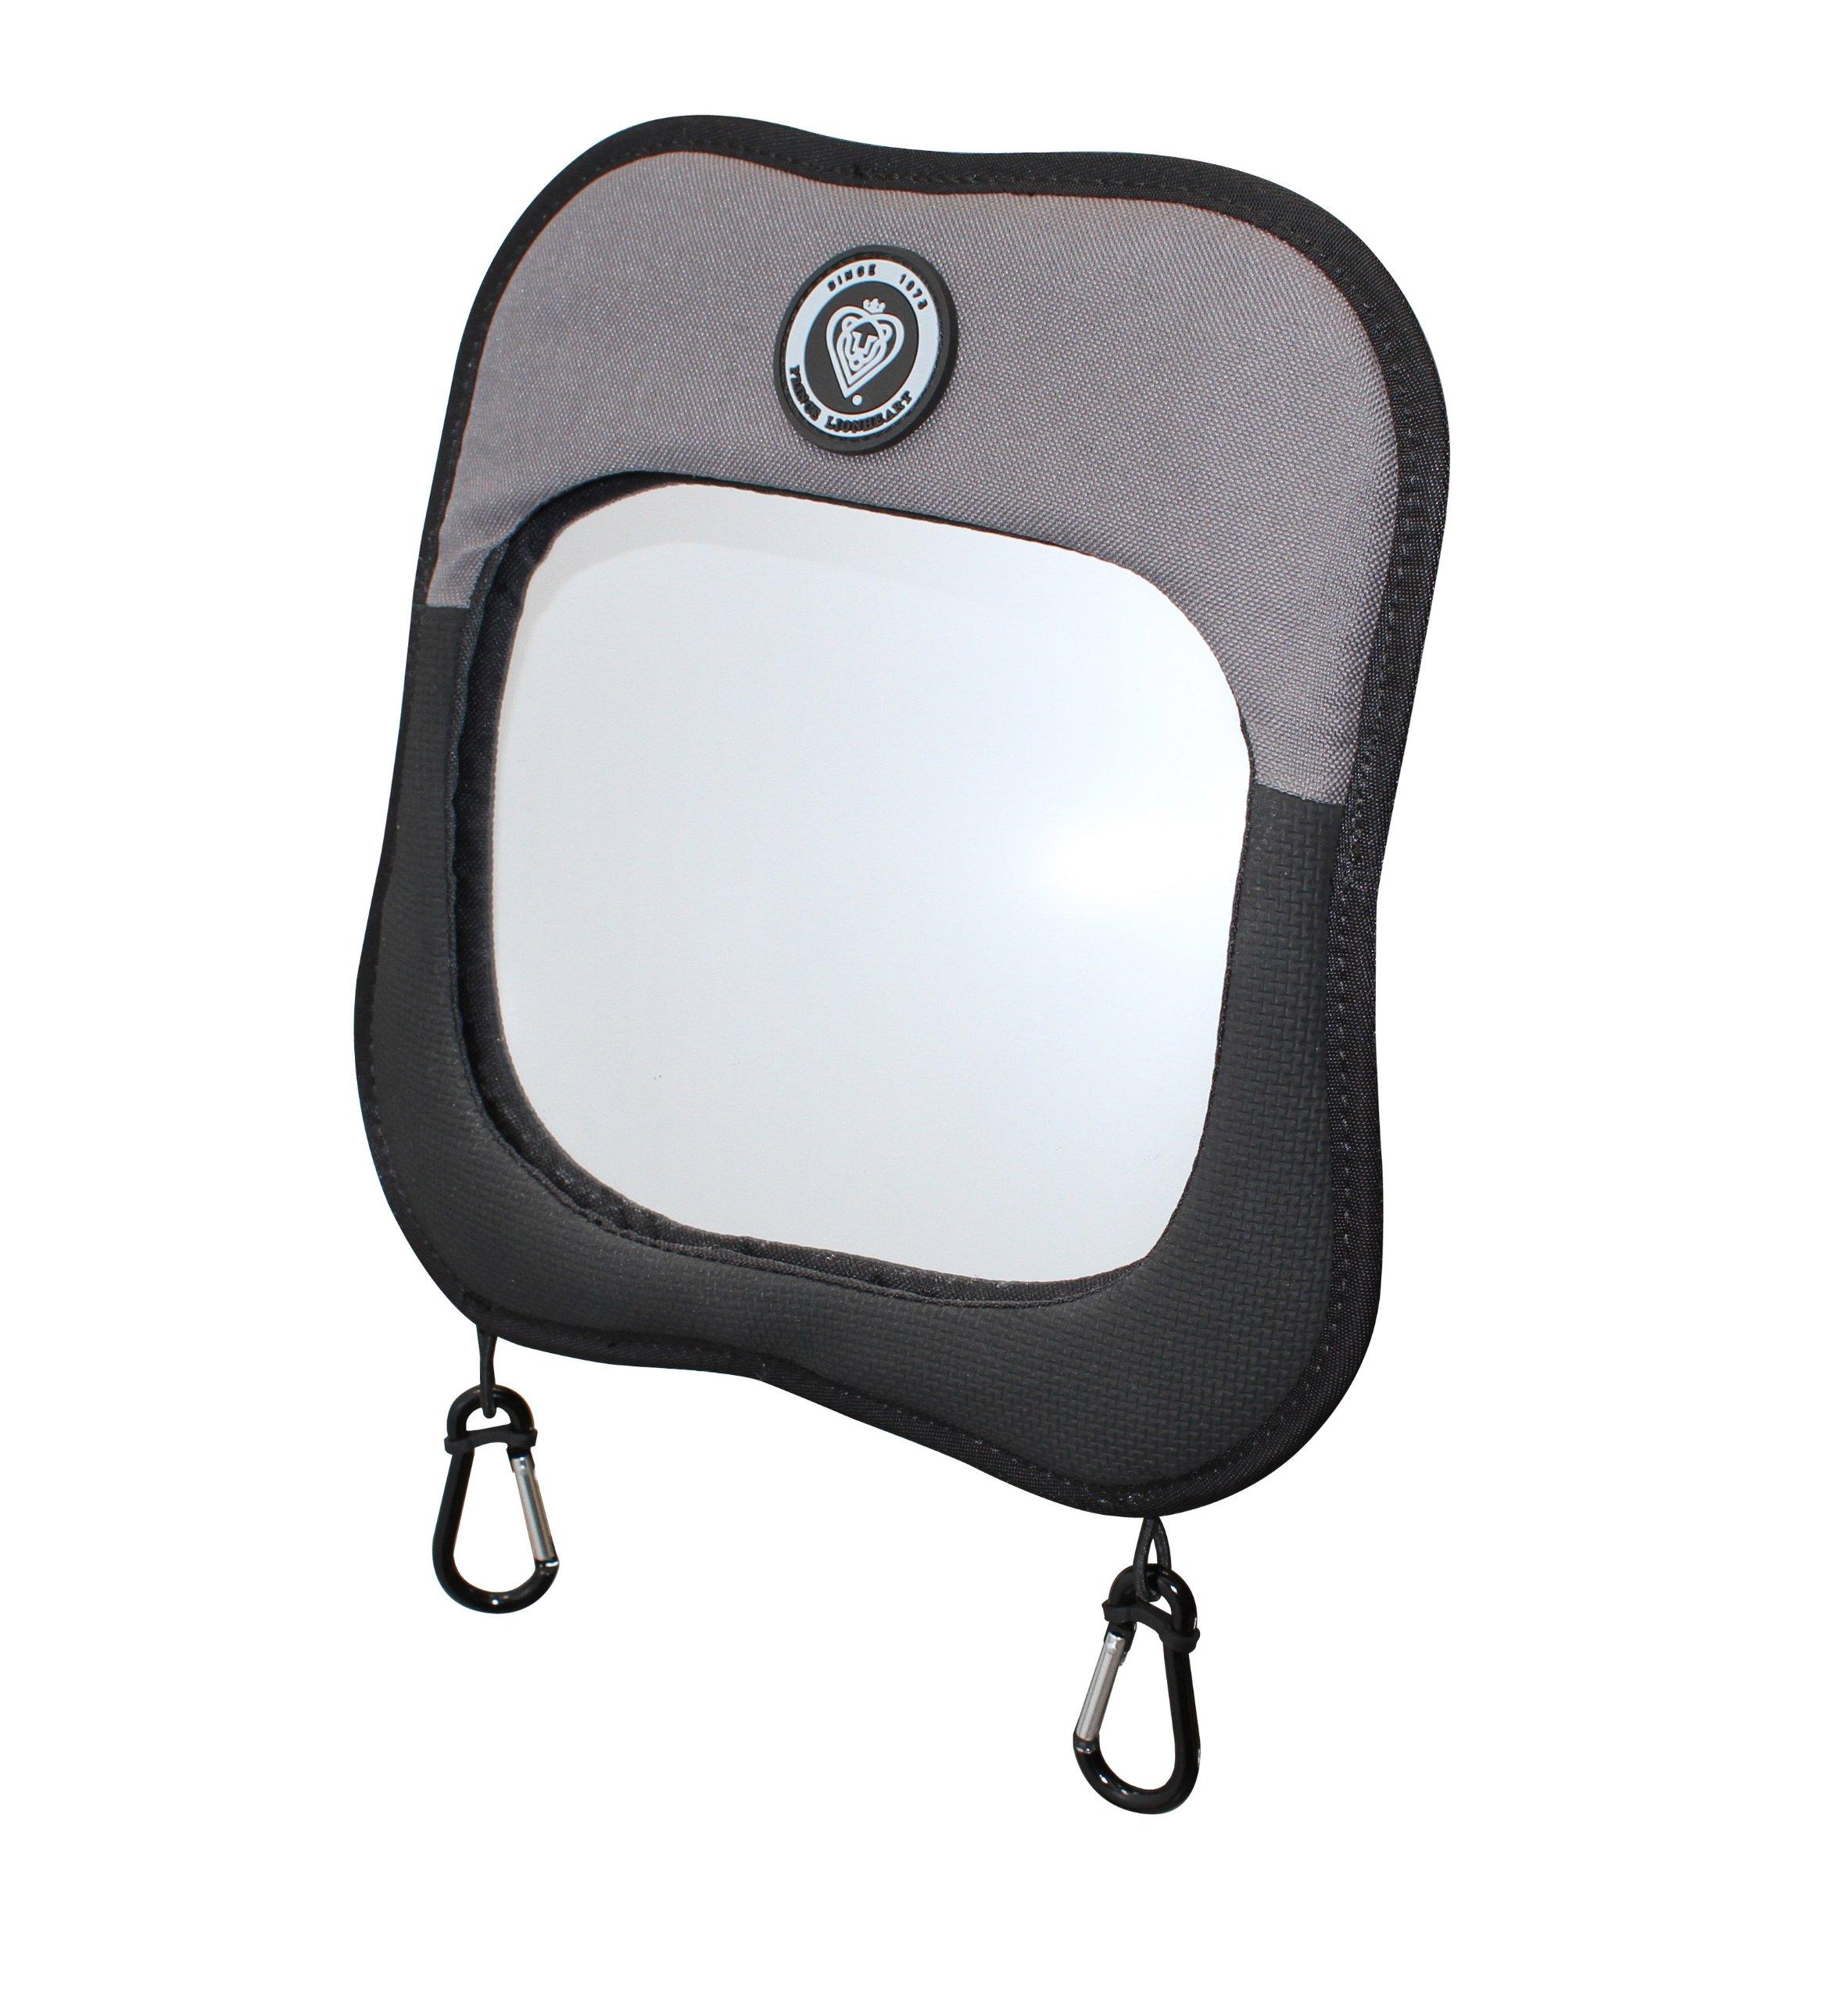 Prince Lionheart Child View Mirror, Black by Prince Lionheart